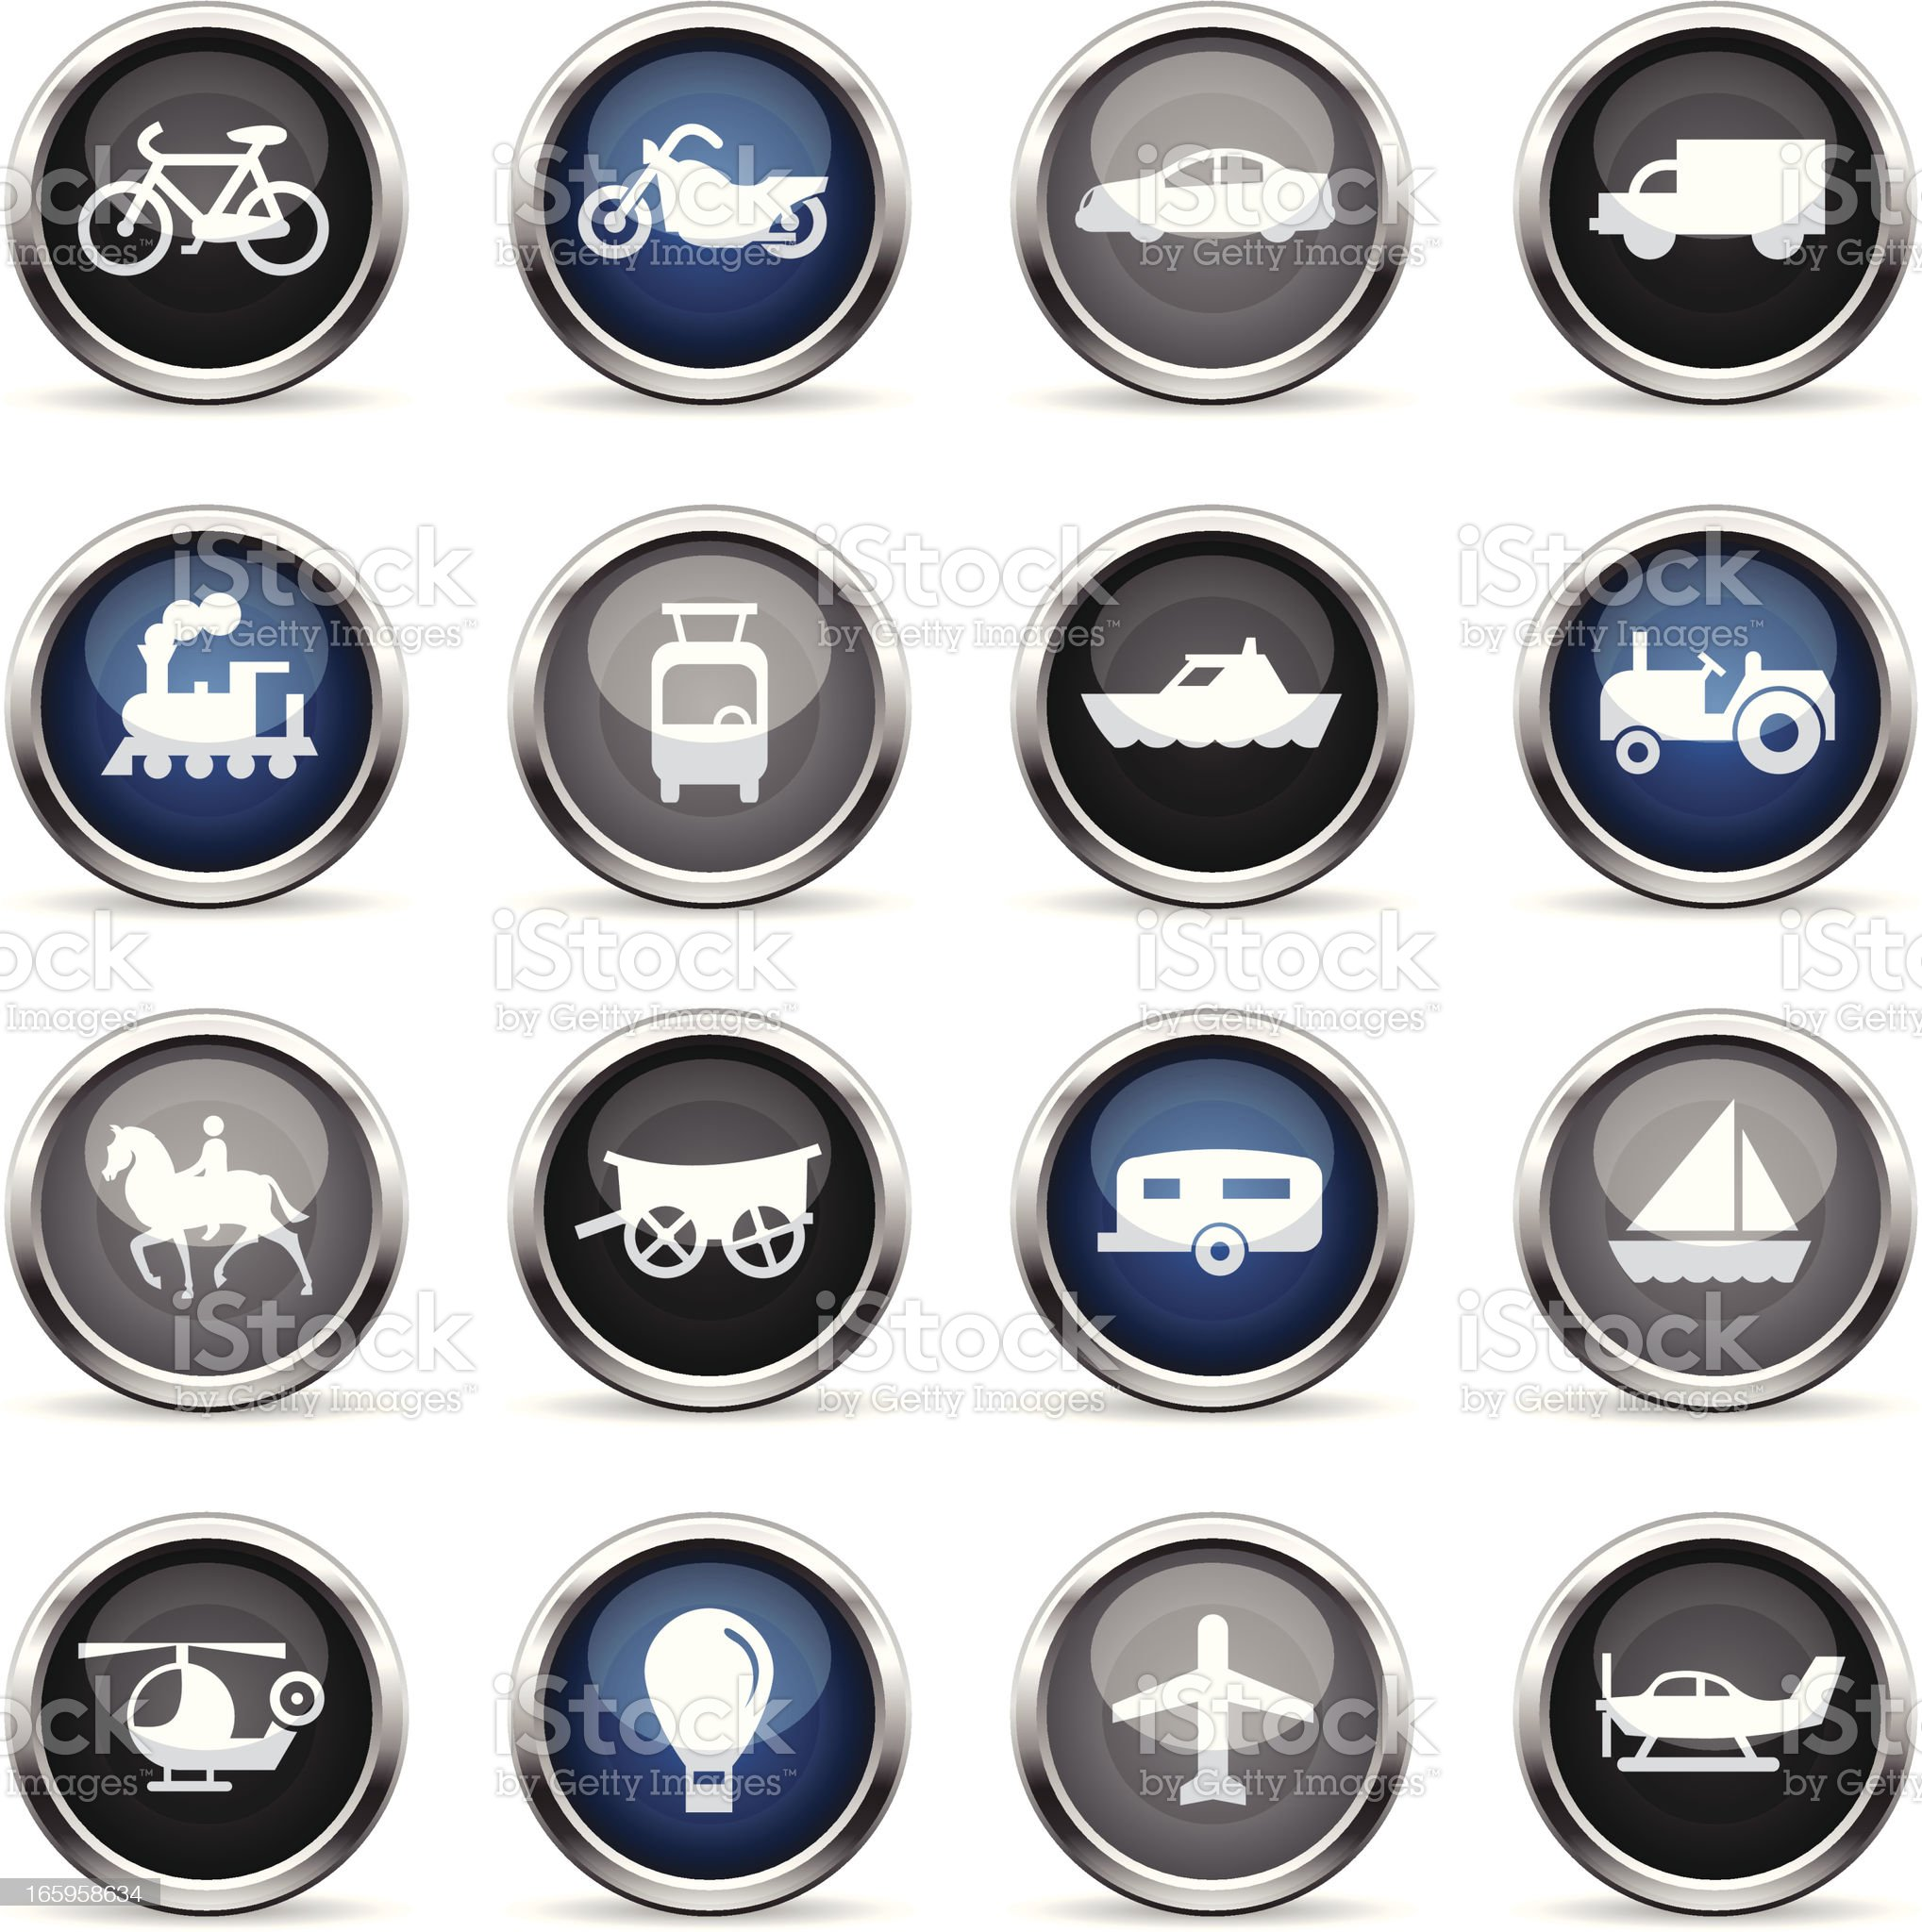 Supergloss Icons - Transportation royalty-free stock vector art